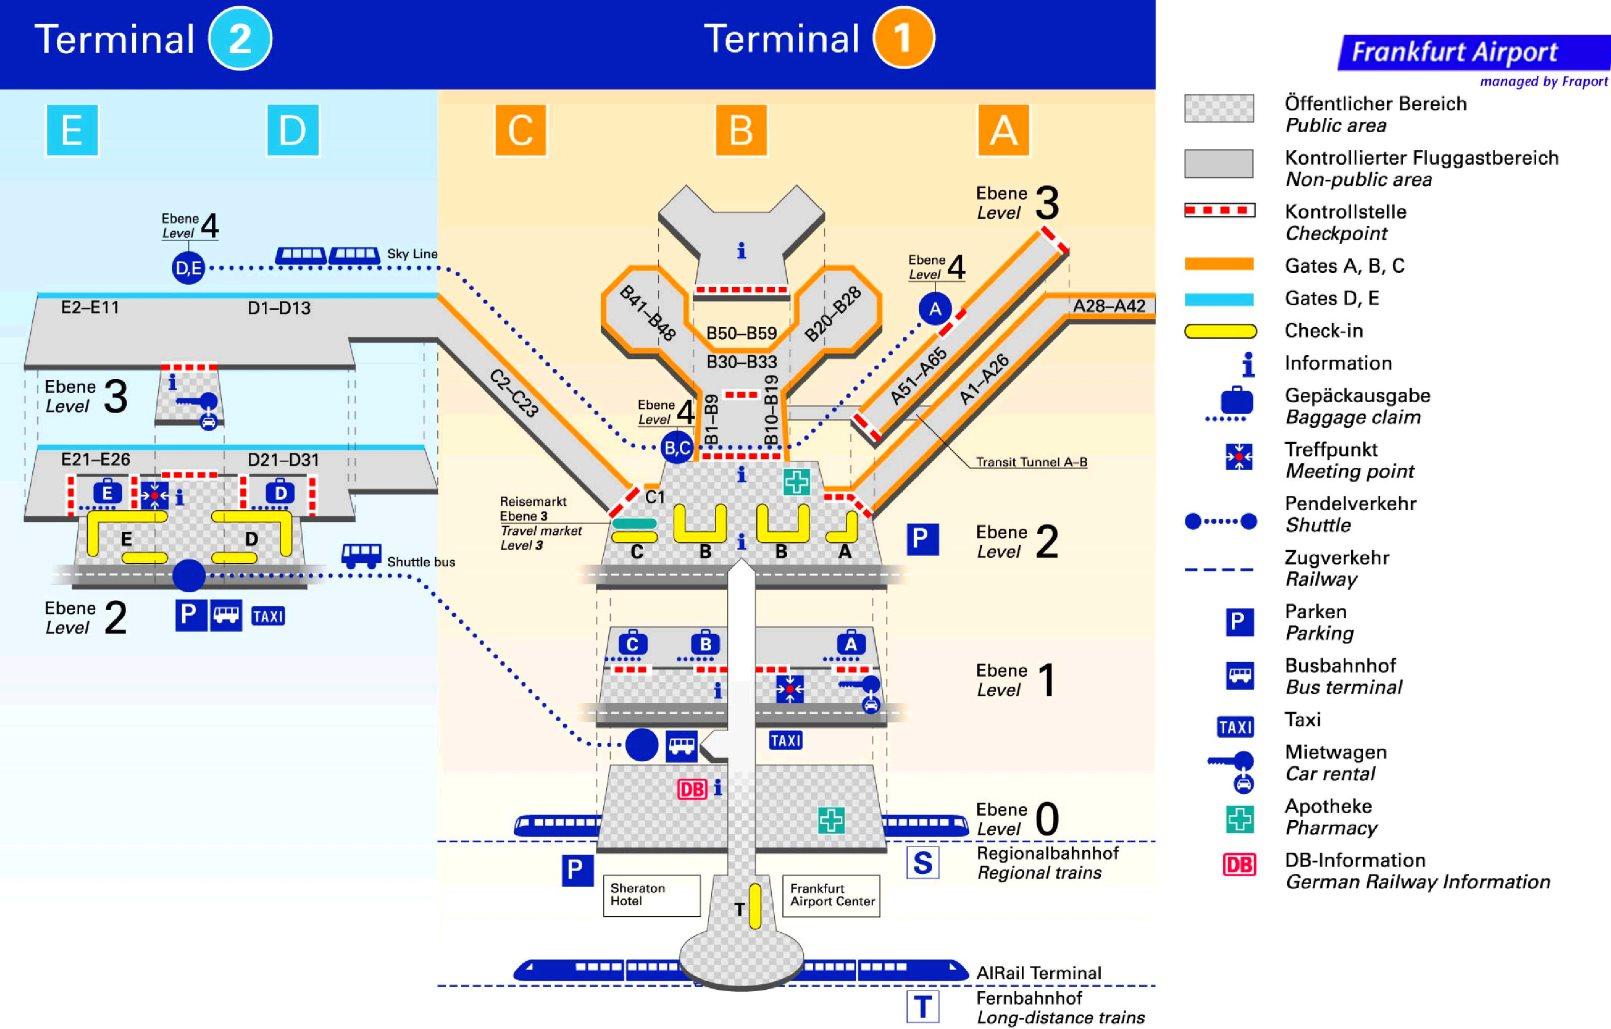 Frankfurter Flughafen Plan